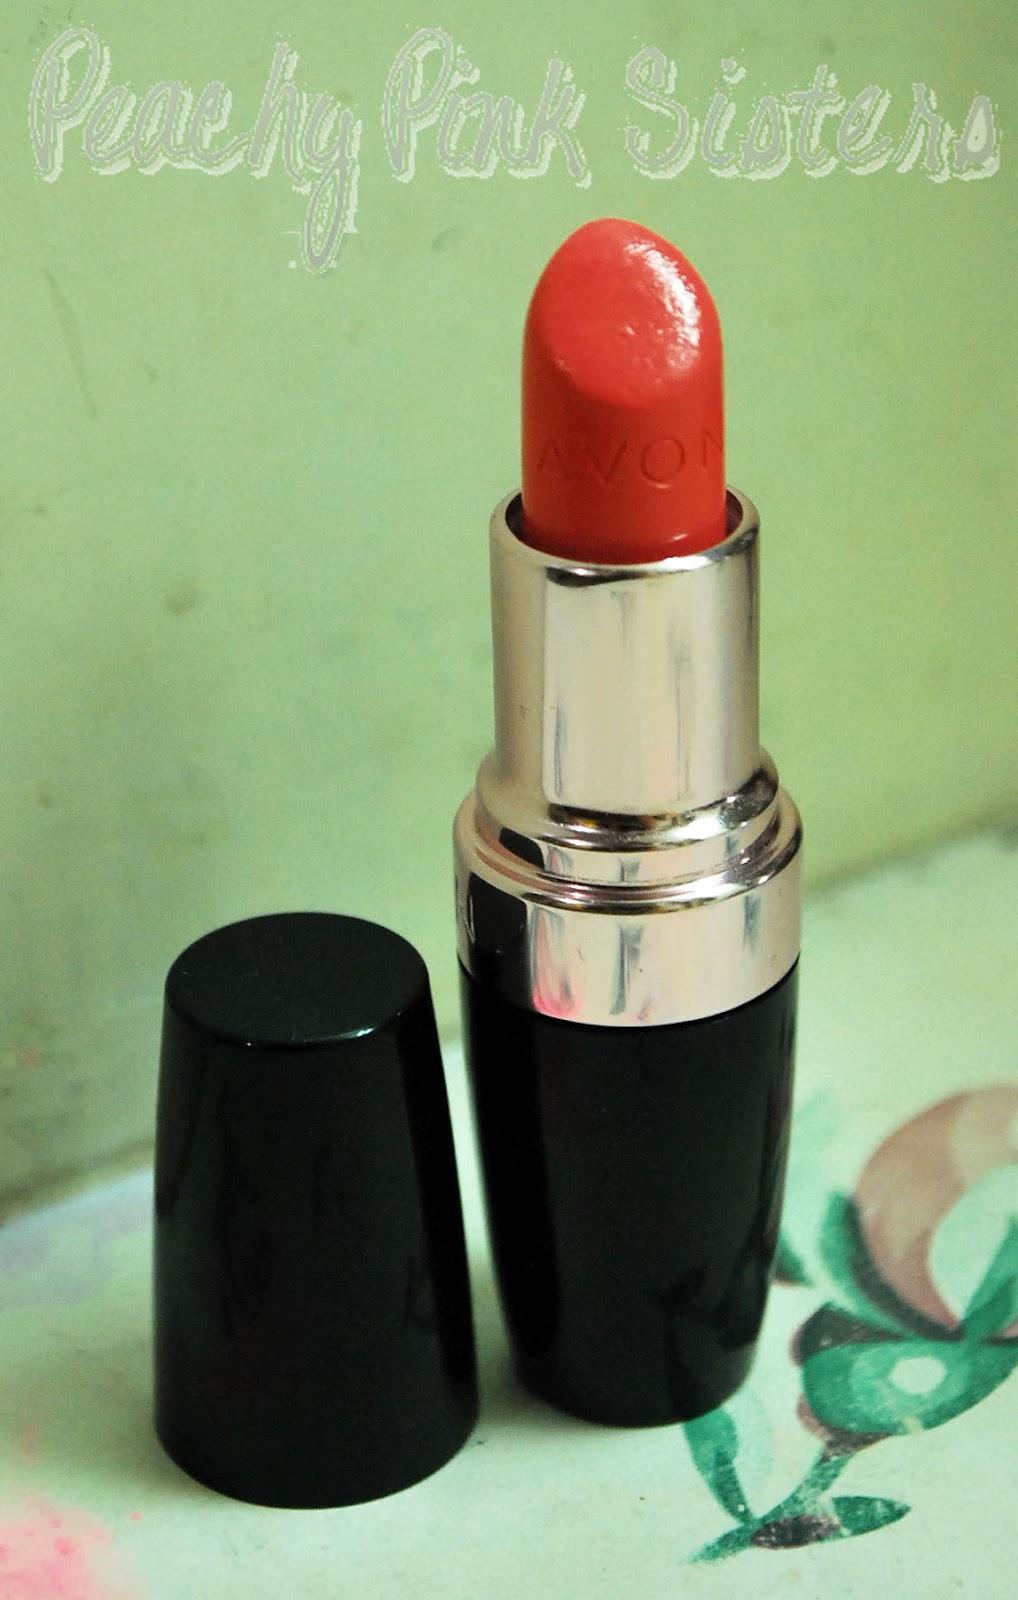 Peachy Pink Sisters: Avon Ultra Moisture Rich Rose